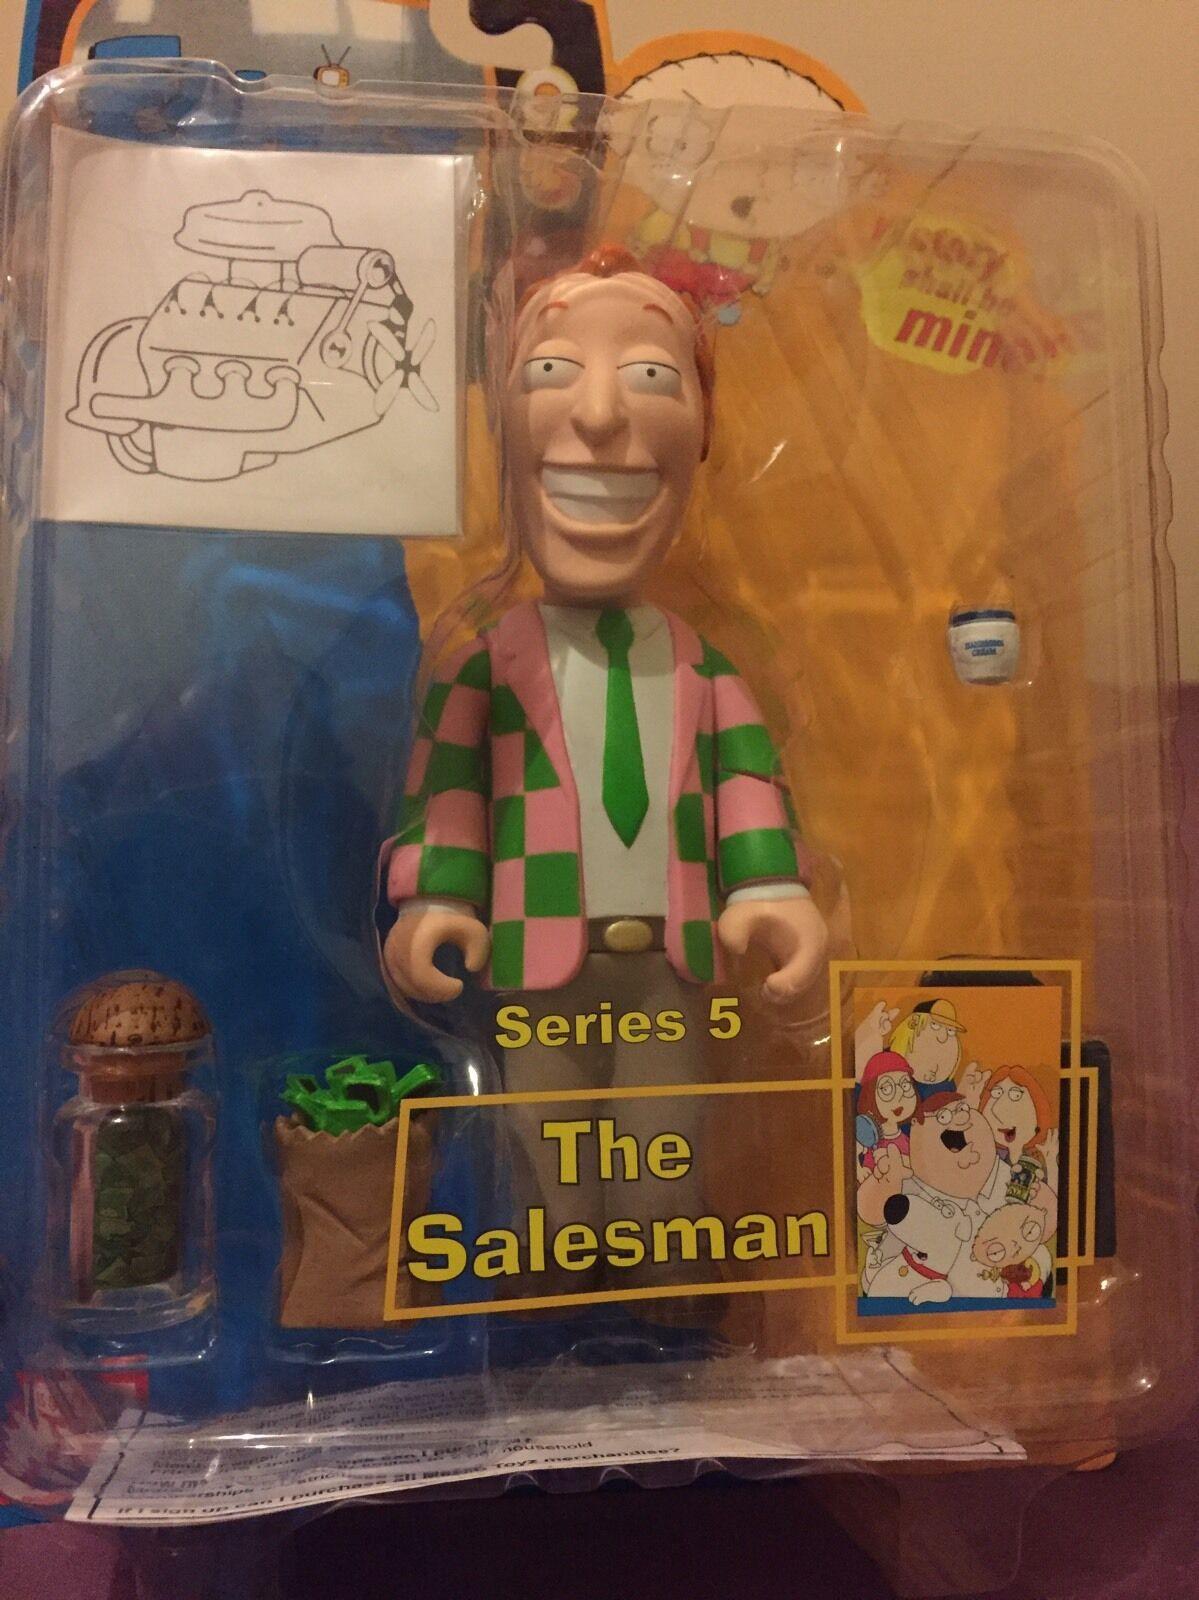 Der verkäufer bild - mezco family guy series 5 -